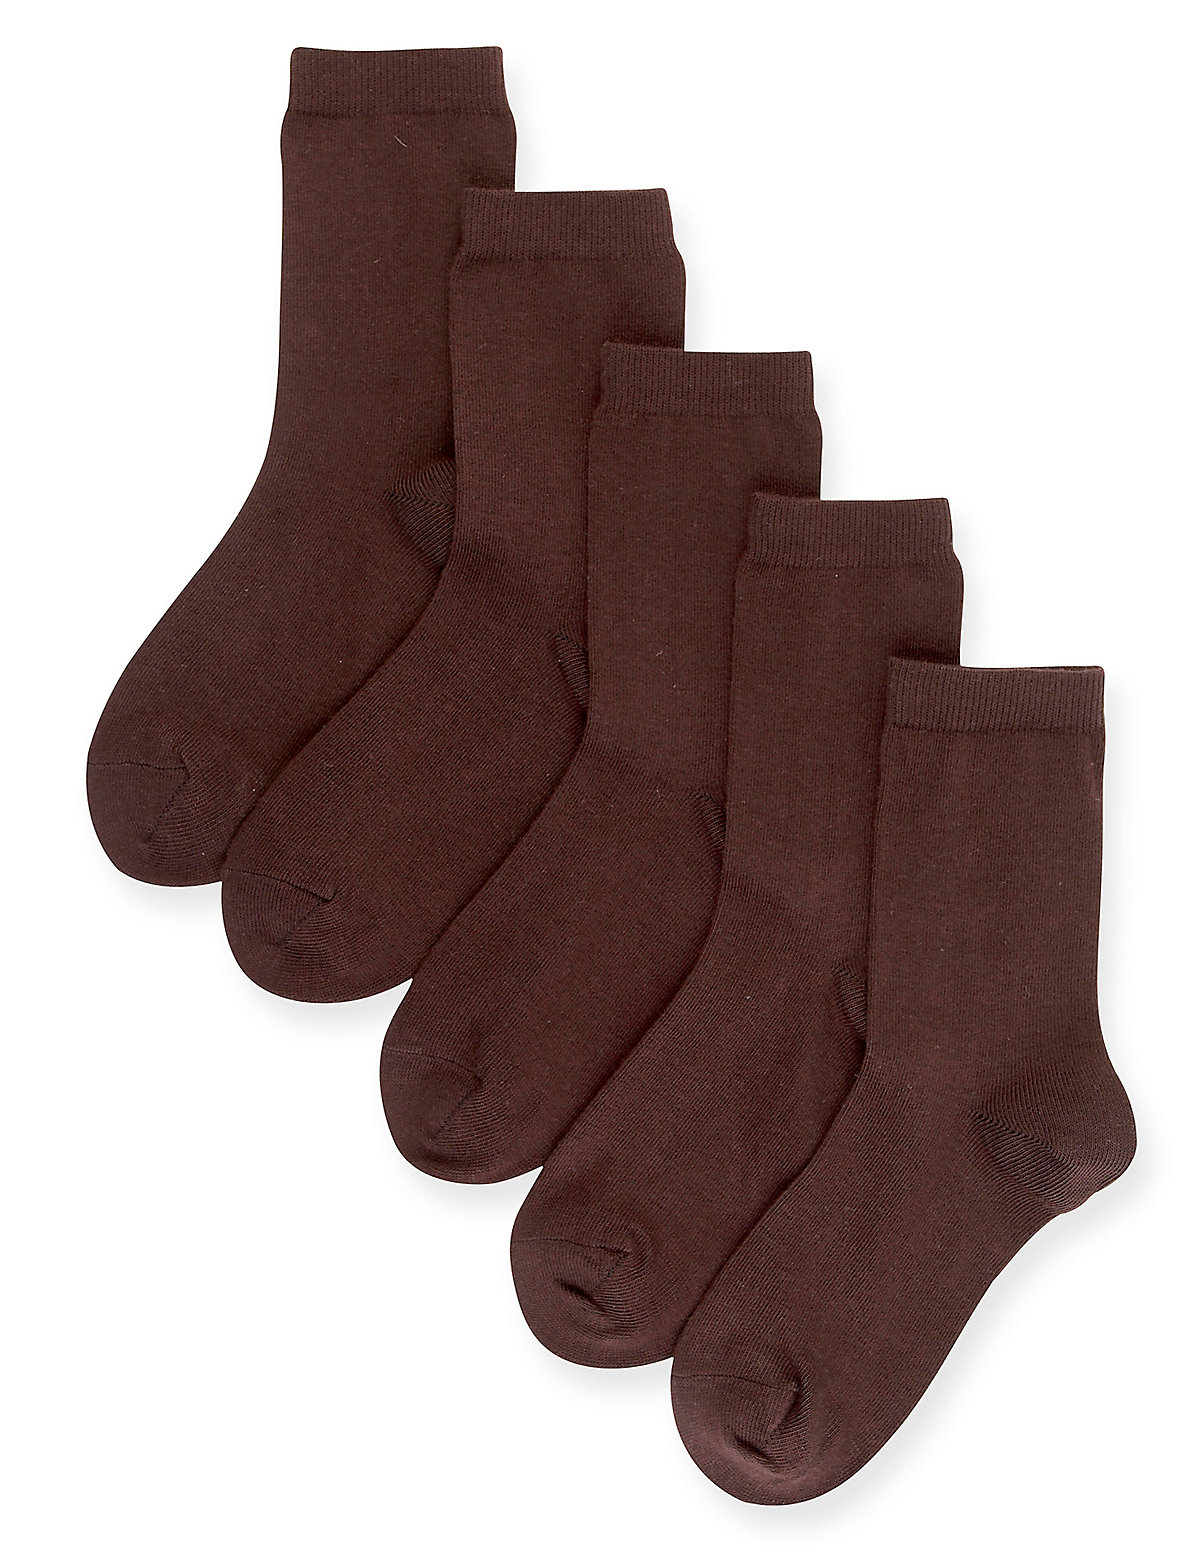 5 Pairs of Freshfeet Cotton Rich School Socks (514 Years)